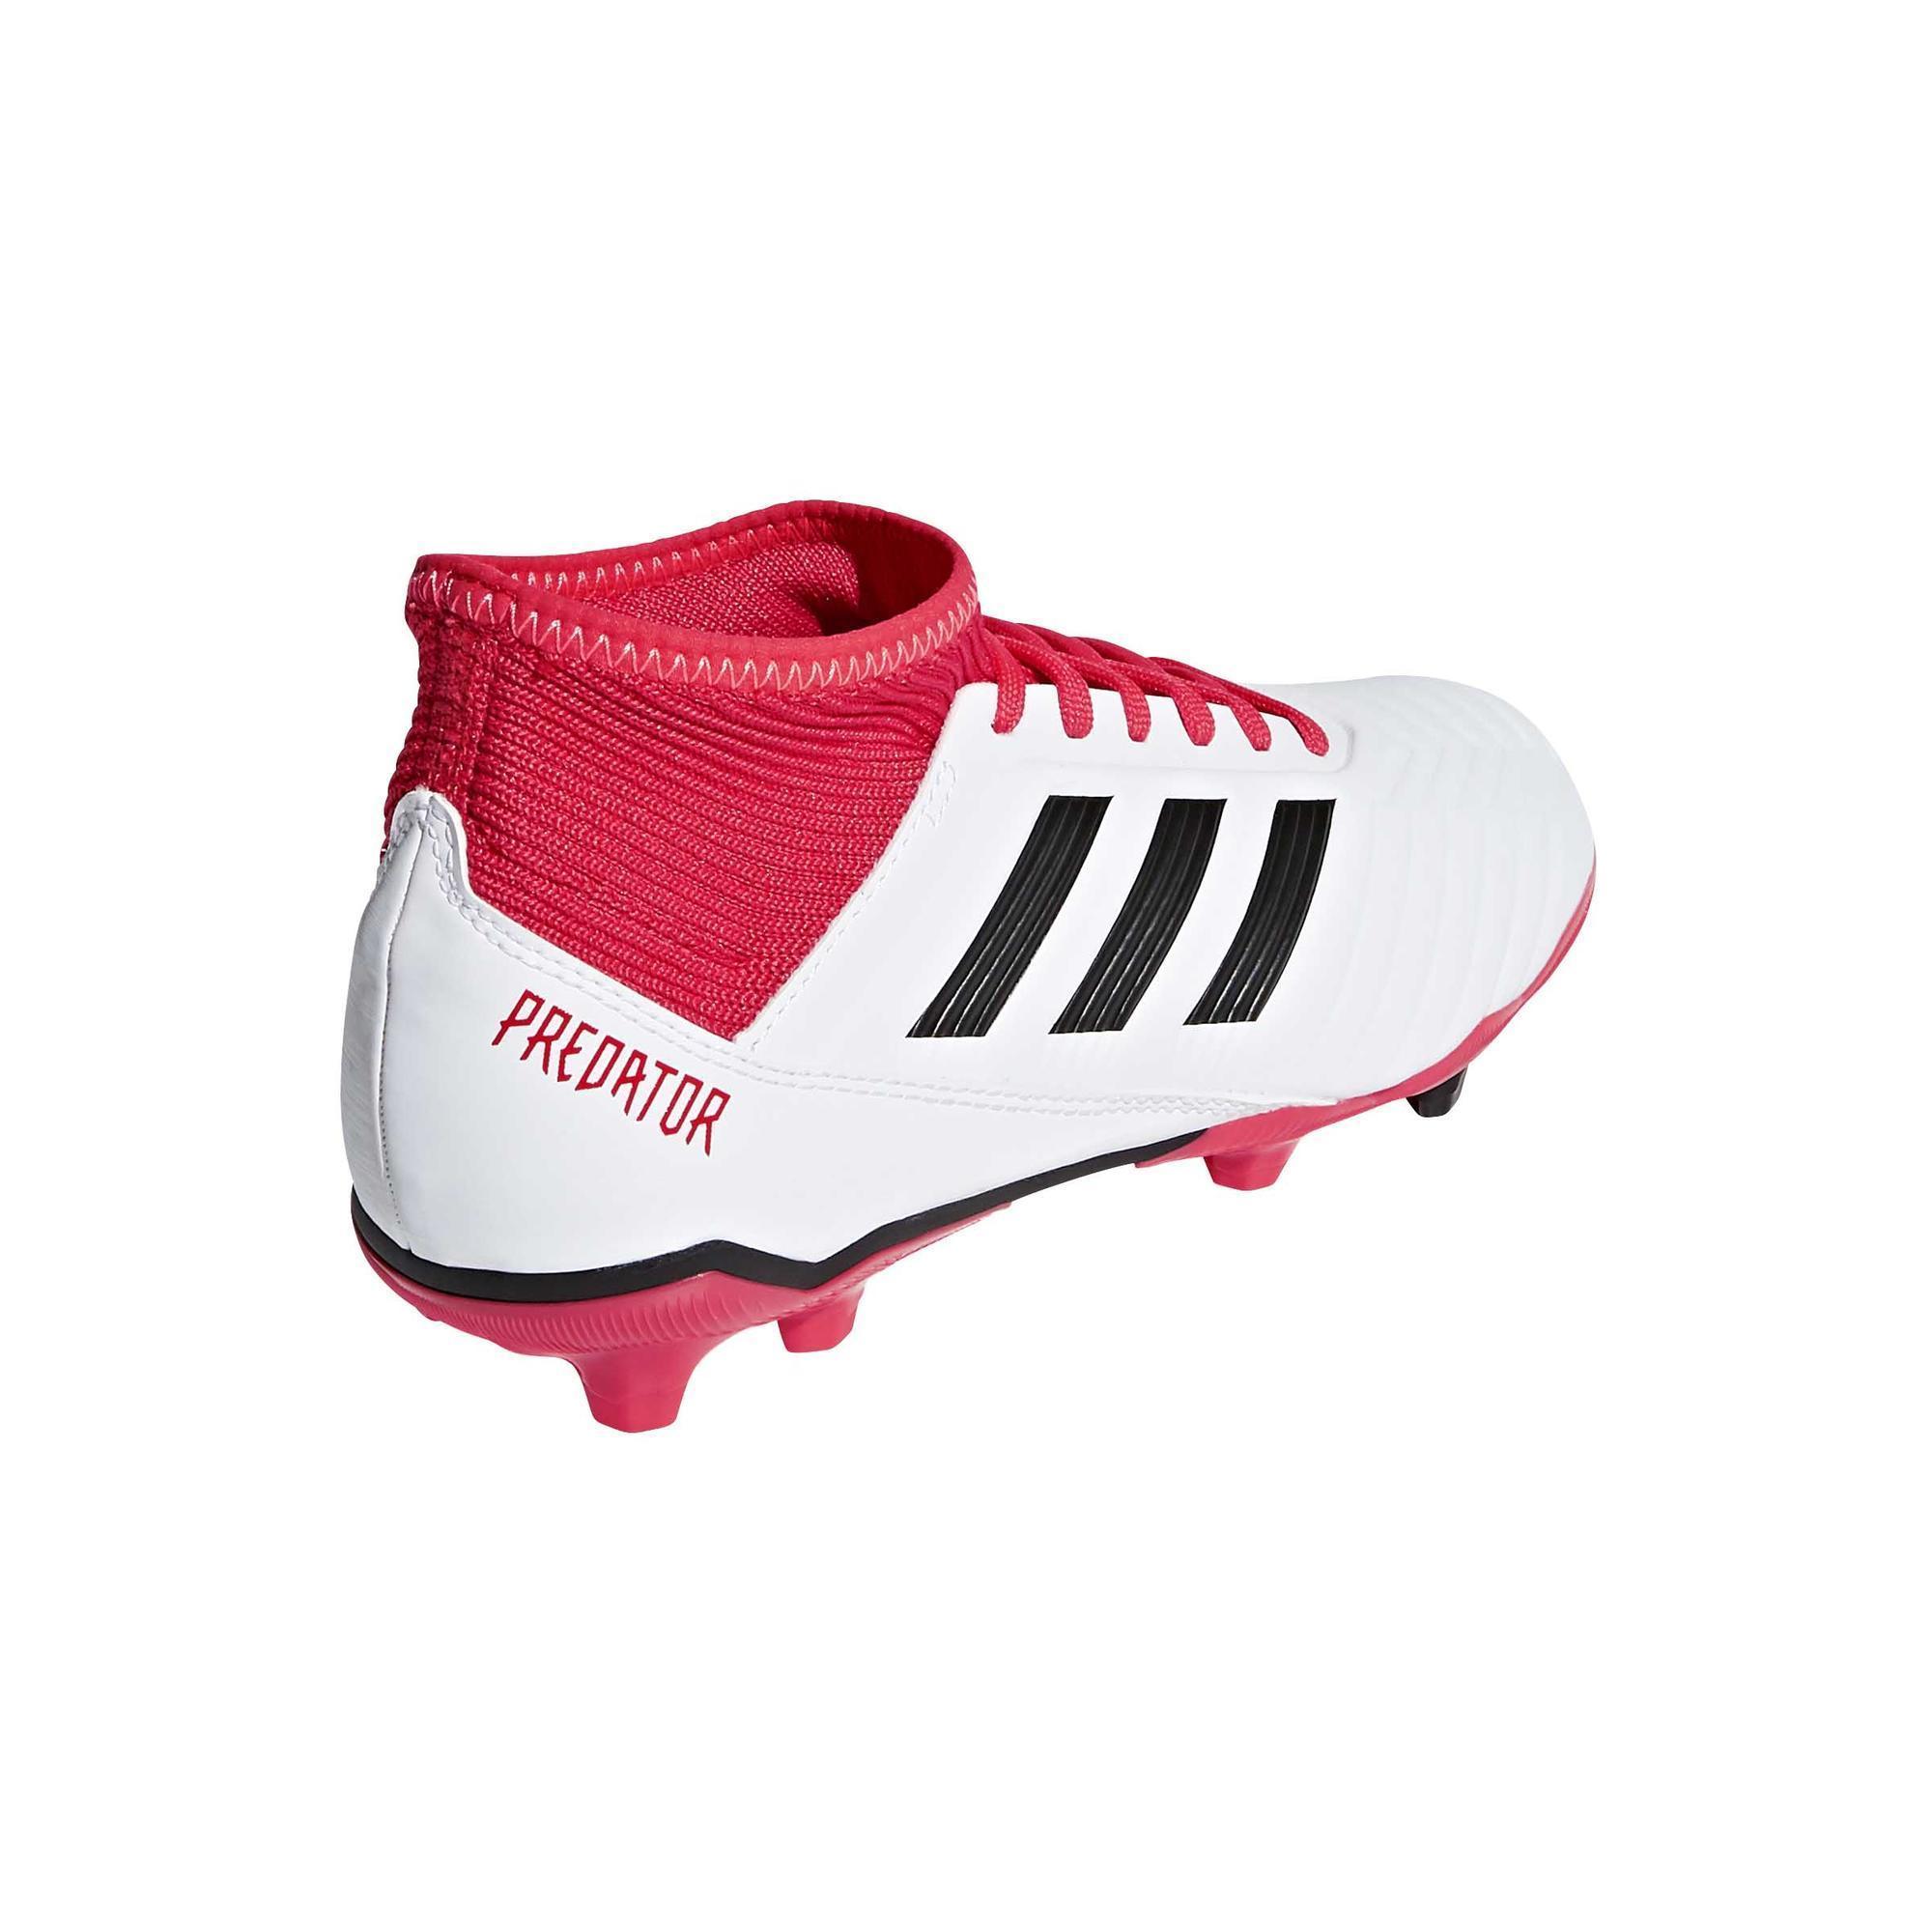 meet f0689 94657 Noire Football Adidas Enfant 18 De 3 Decathlon Fg Chaussure Predator  nqRq7xXdwp